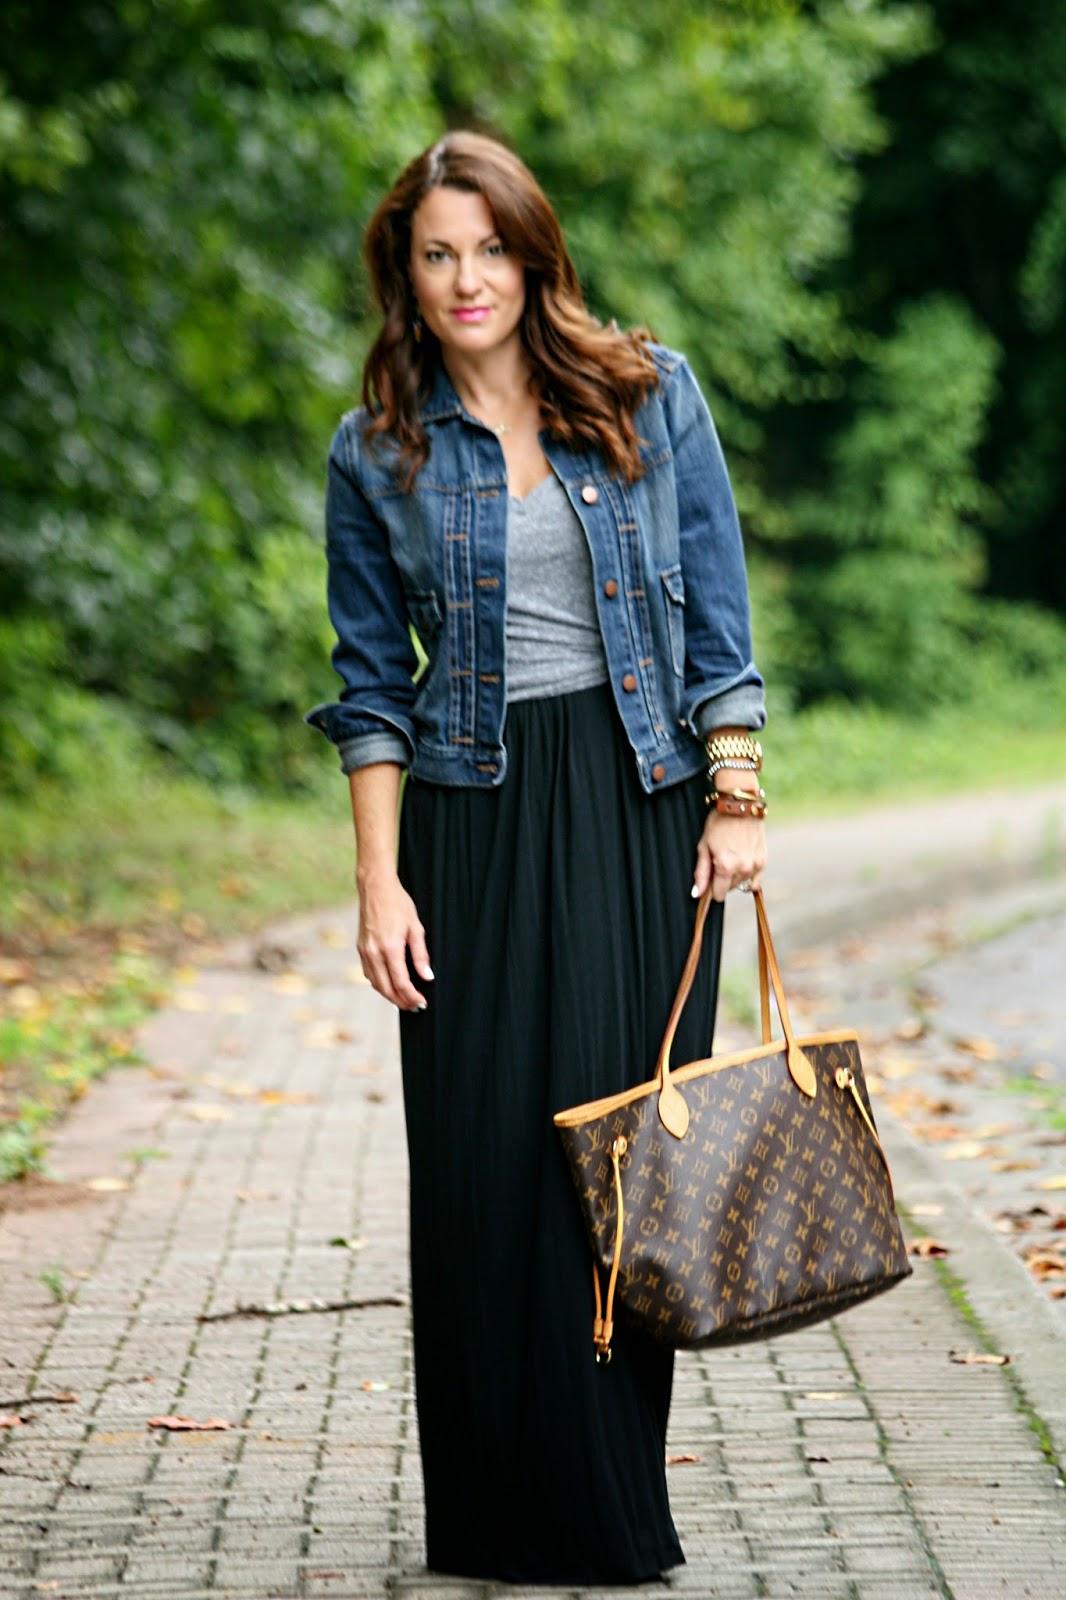 Jean jacket and maxi dress